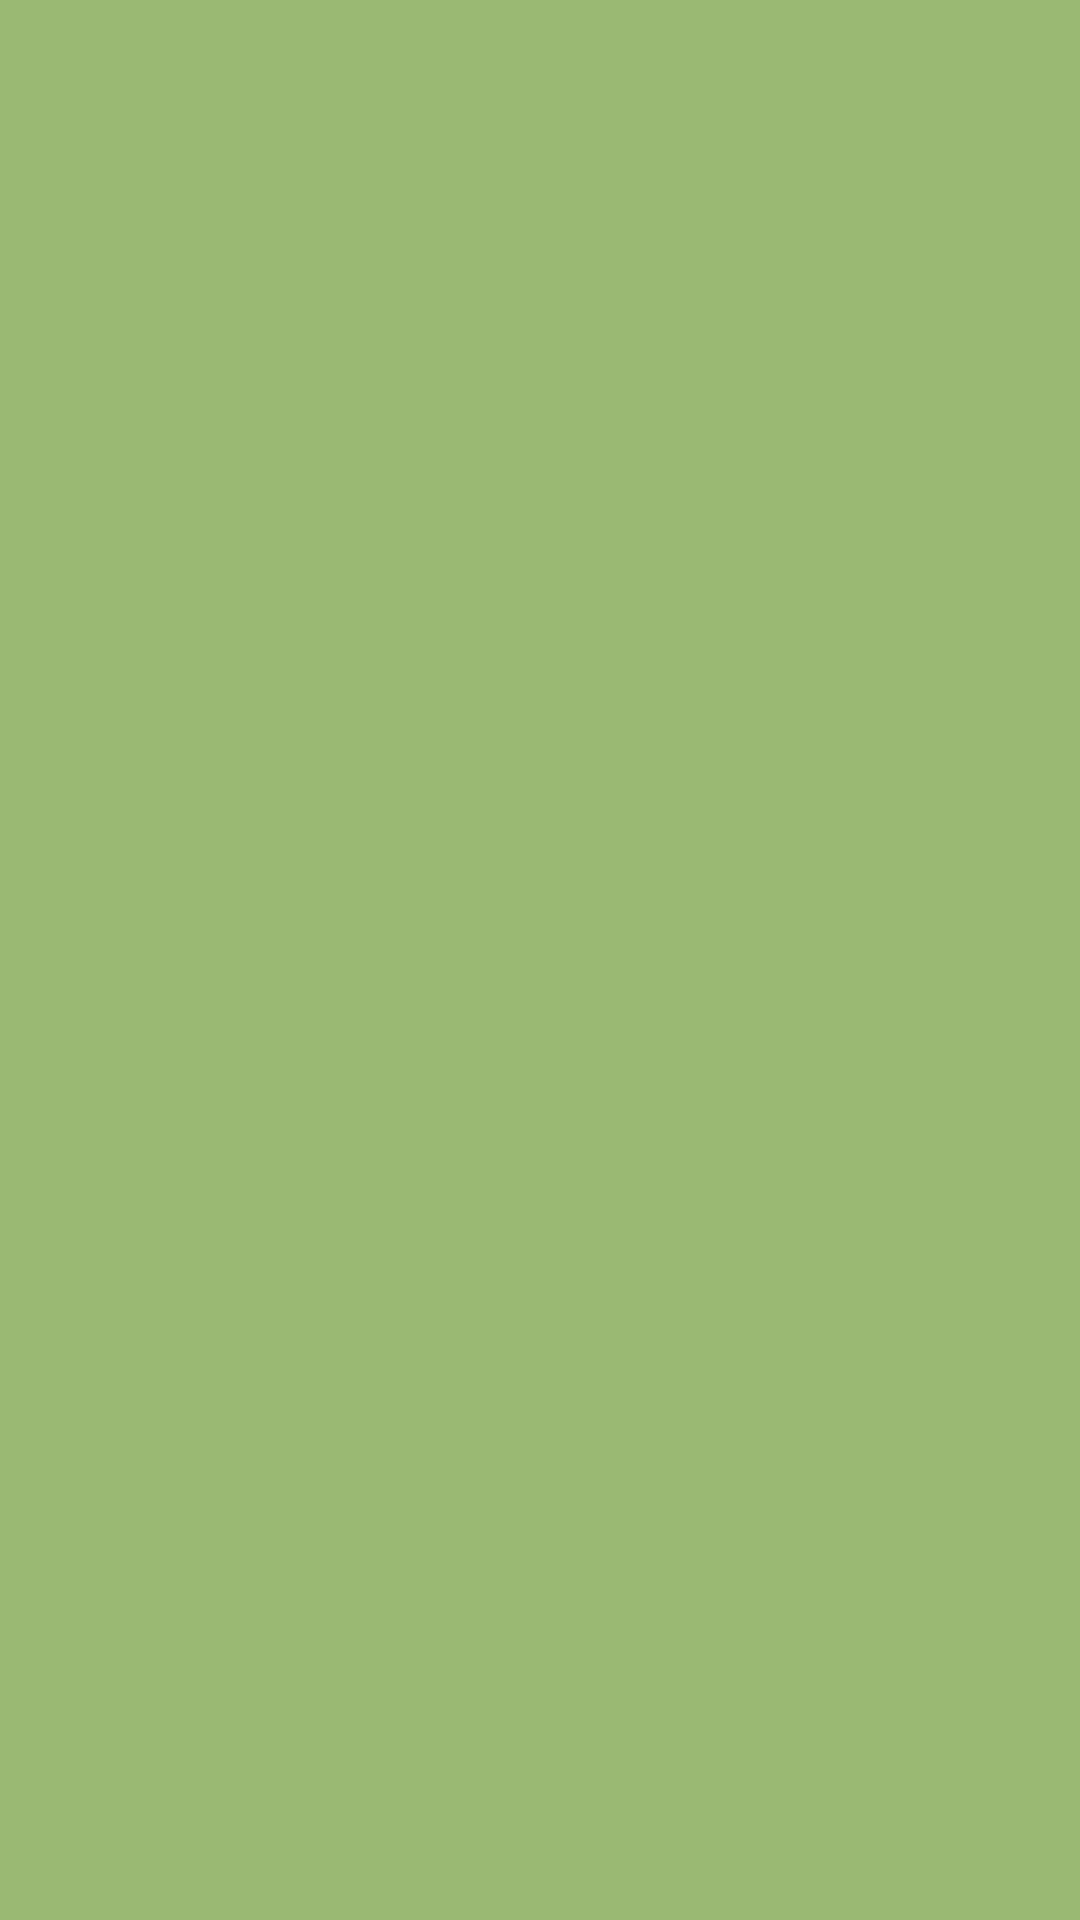 1080x1920 Olivine Solid Color Background